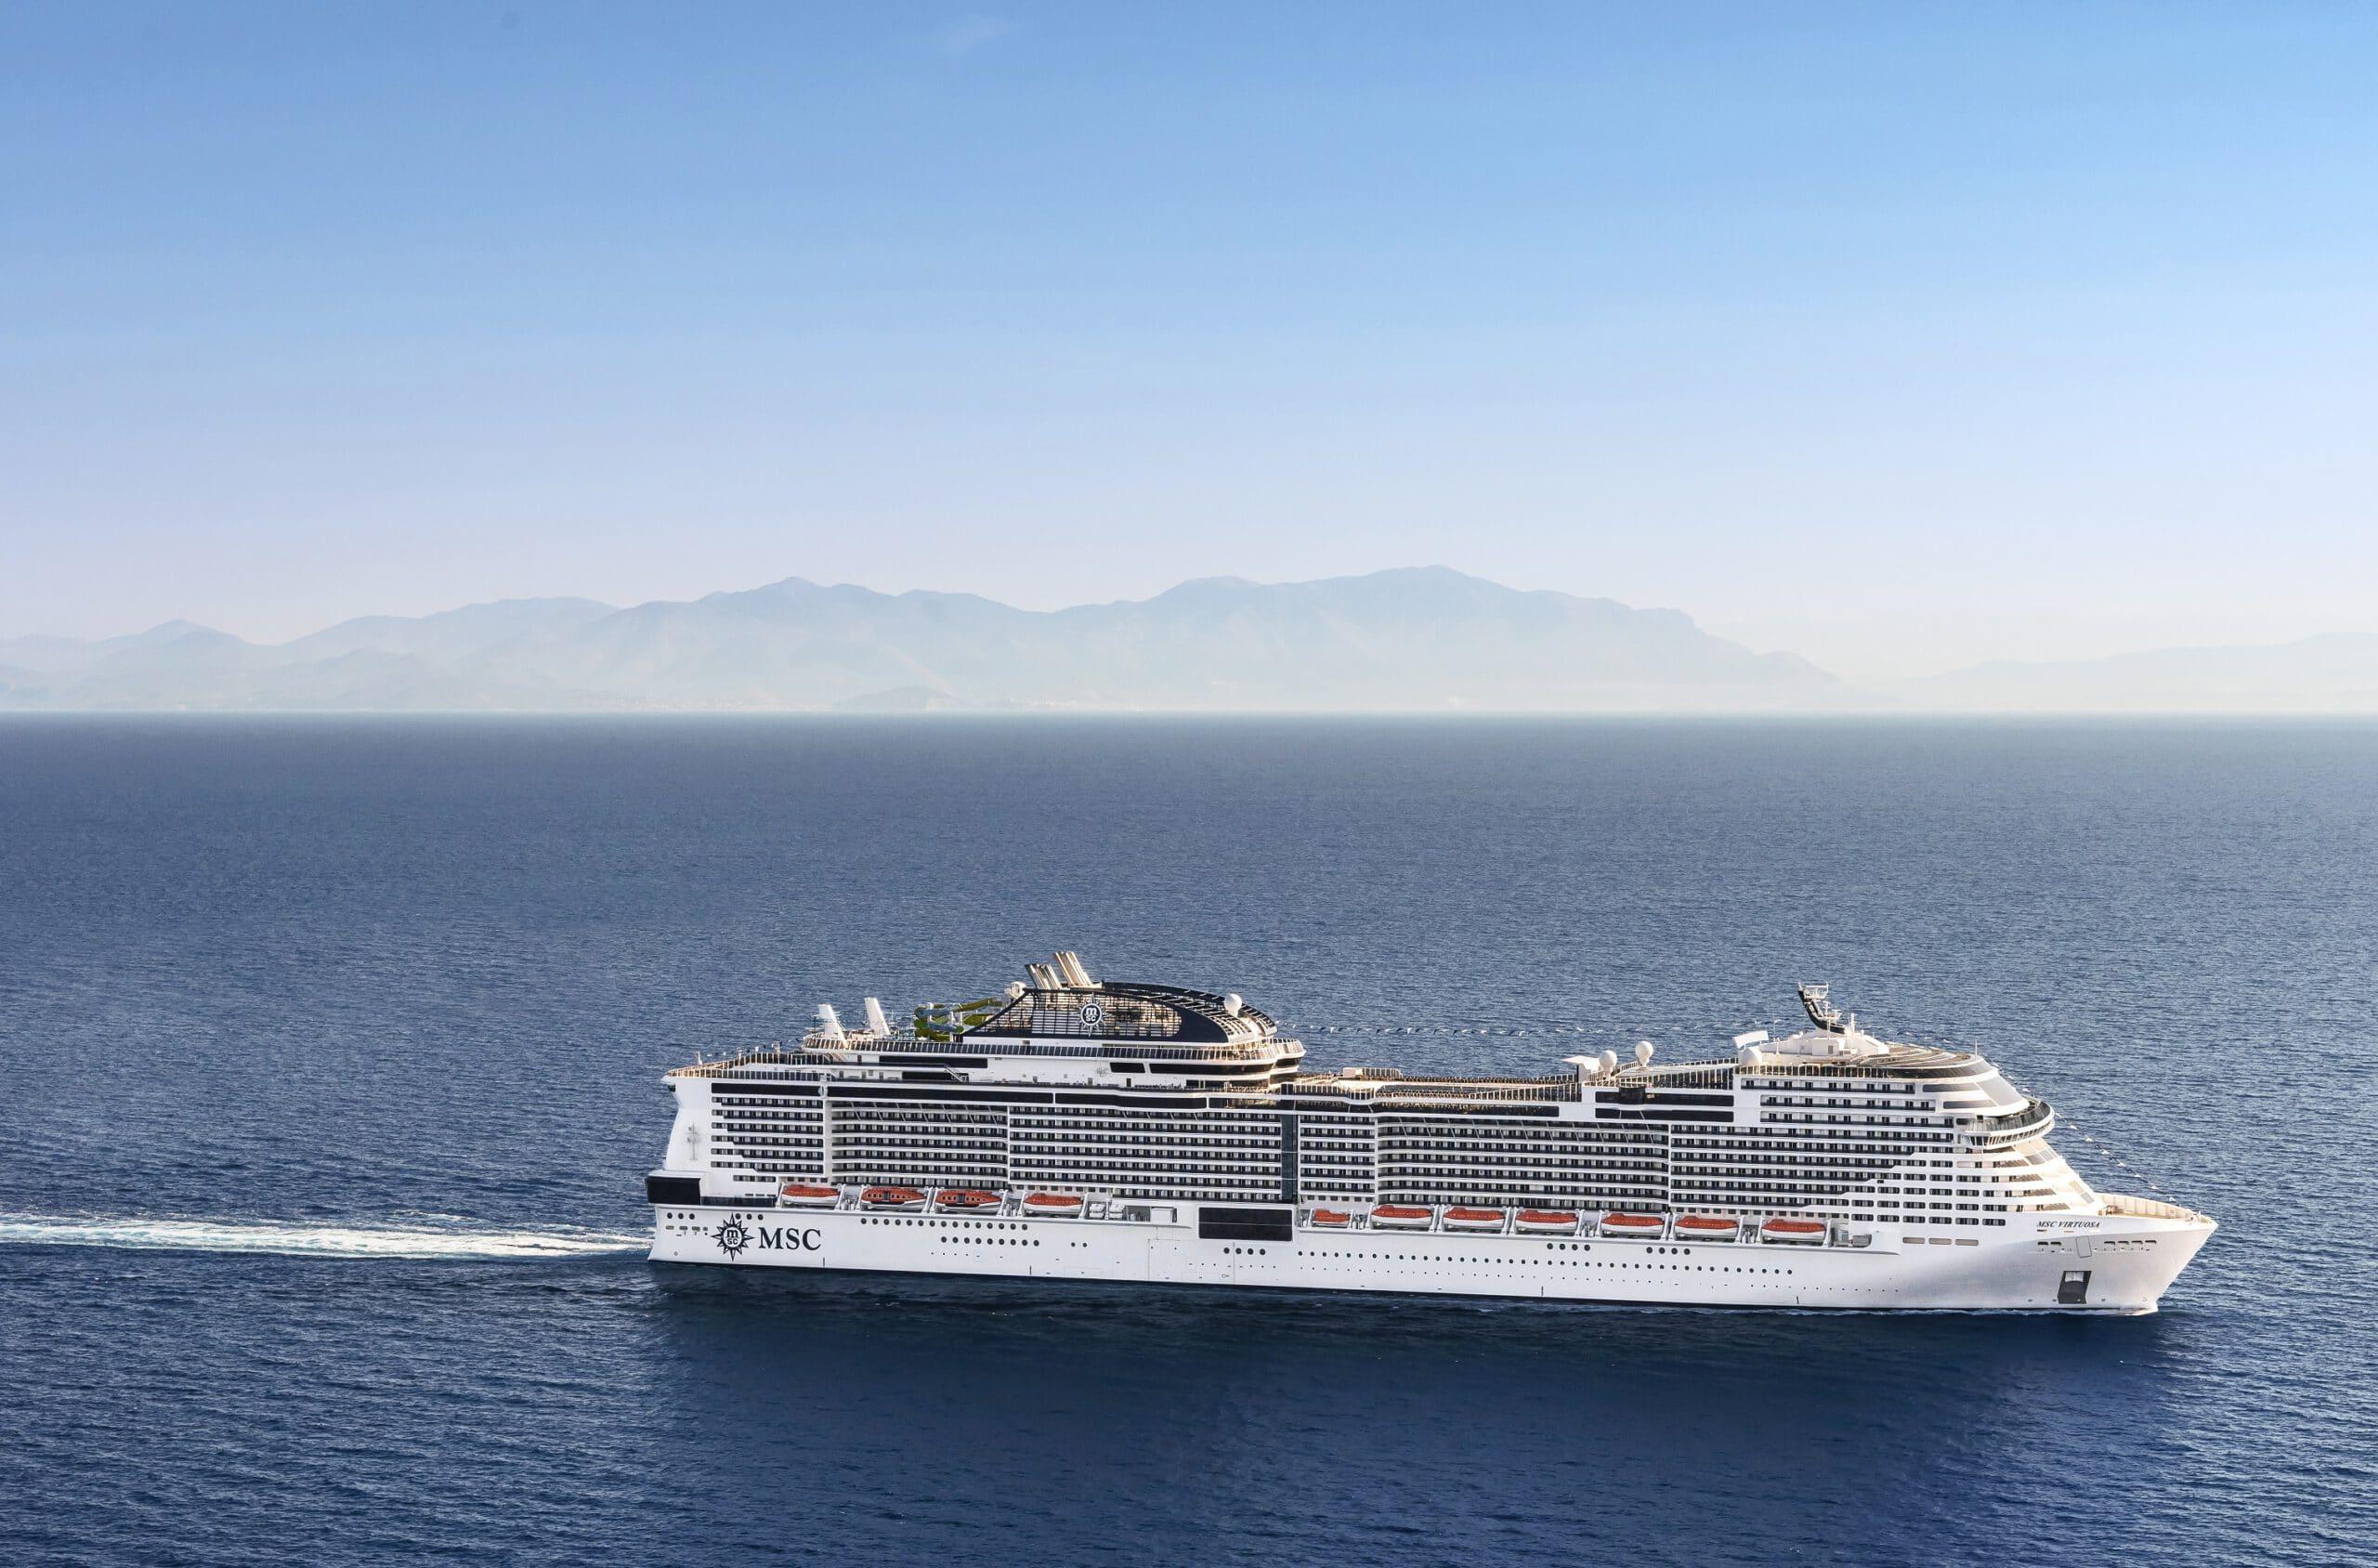 MSC-Cruises-MSC-Virtuosa-exterior